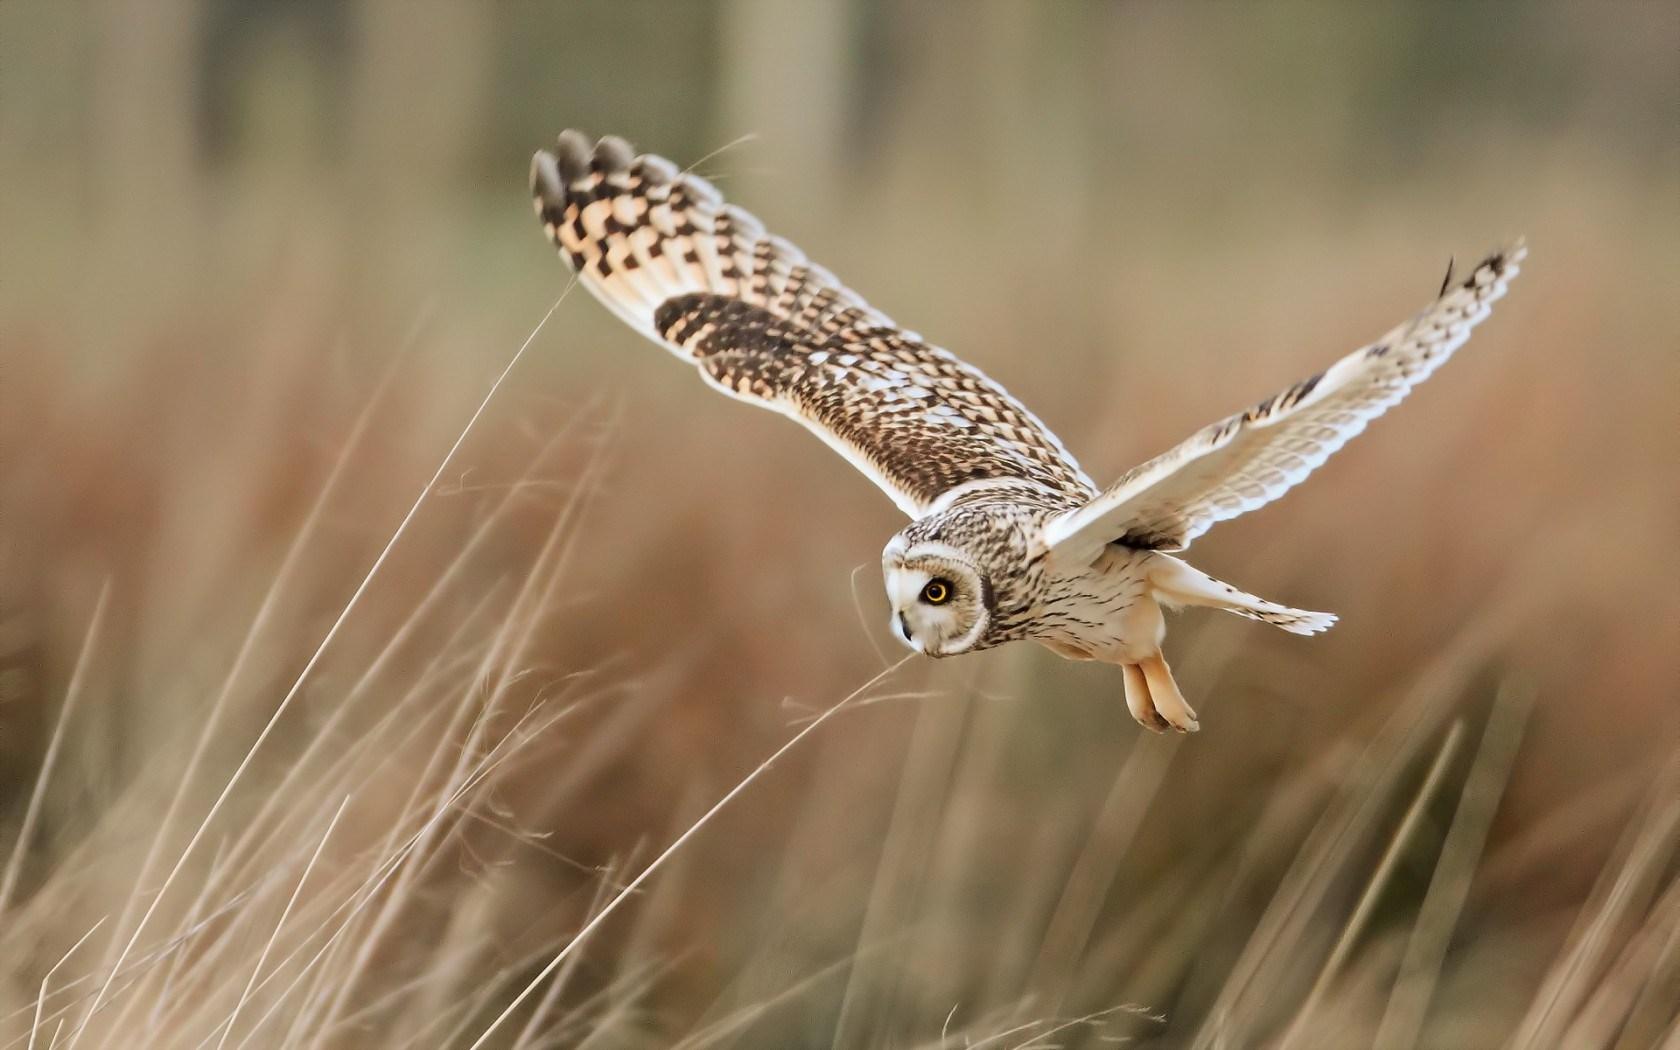 field bird owl flying wallpaper 1680x1050   Magic4Wallscom 1680x1050